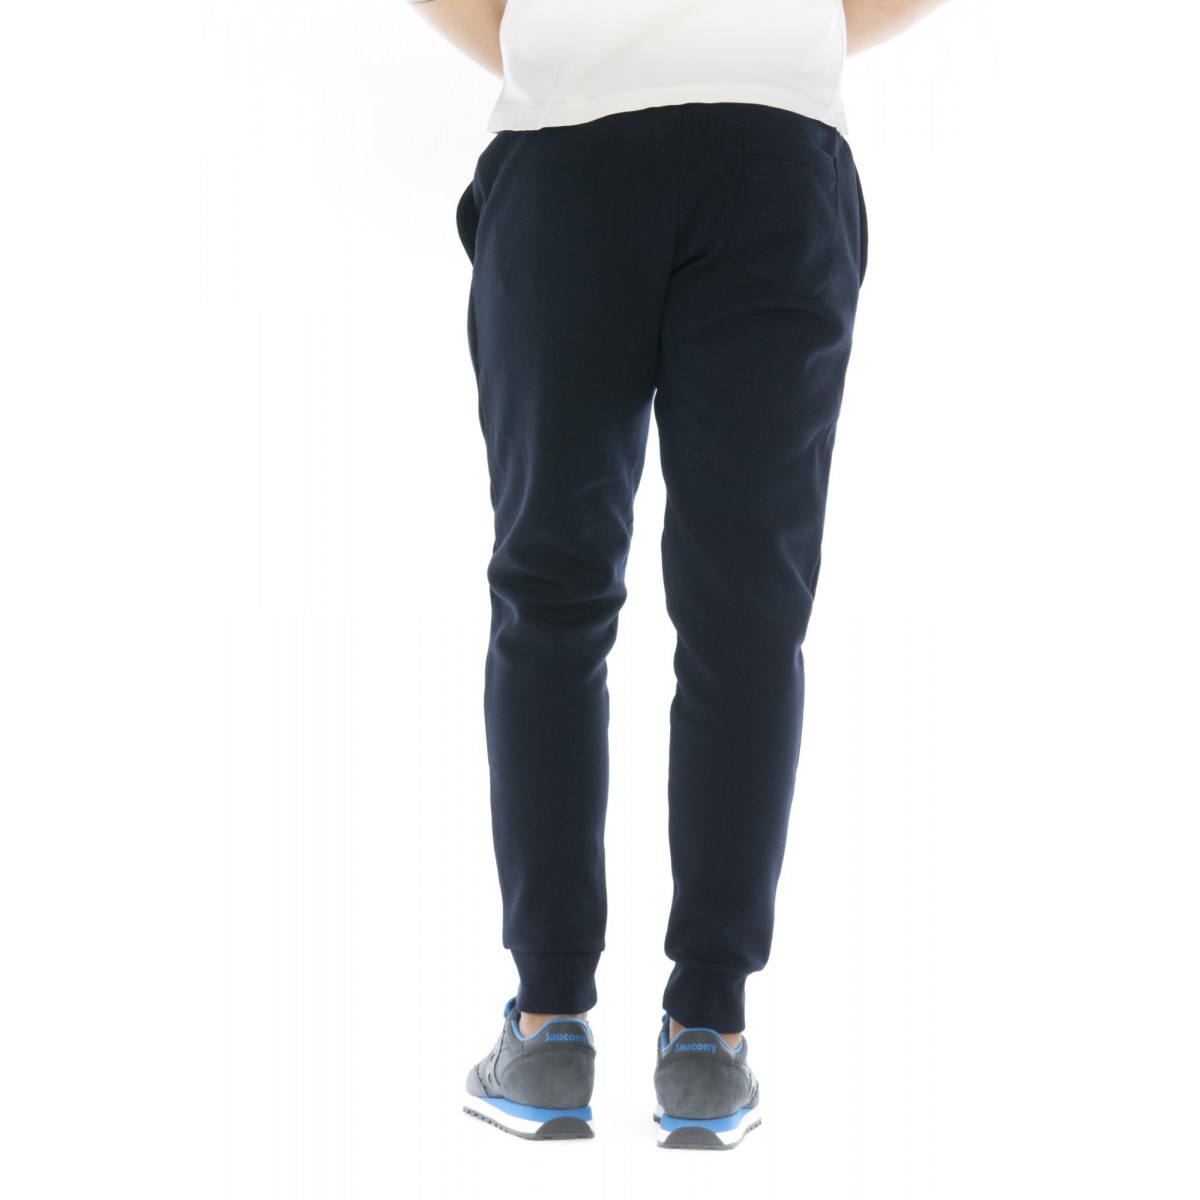 Pantalone uomo - 652314 002 pantalone tuta performance